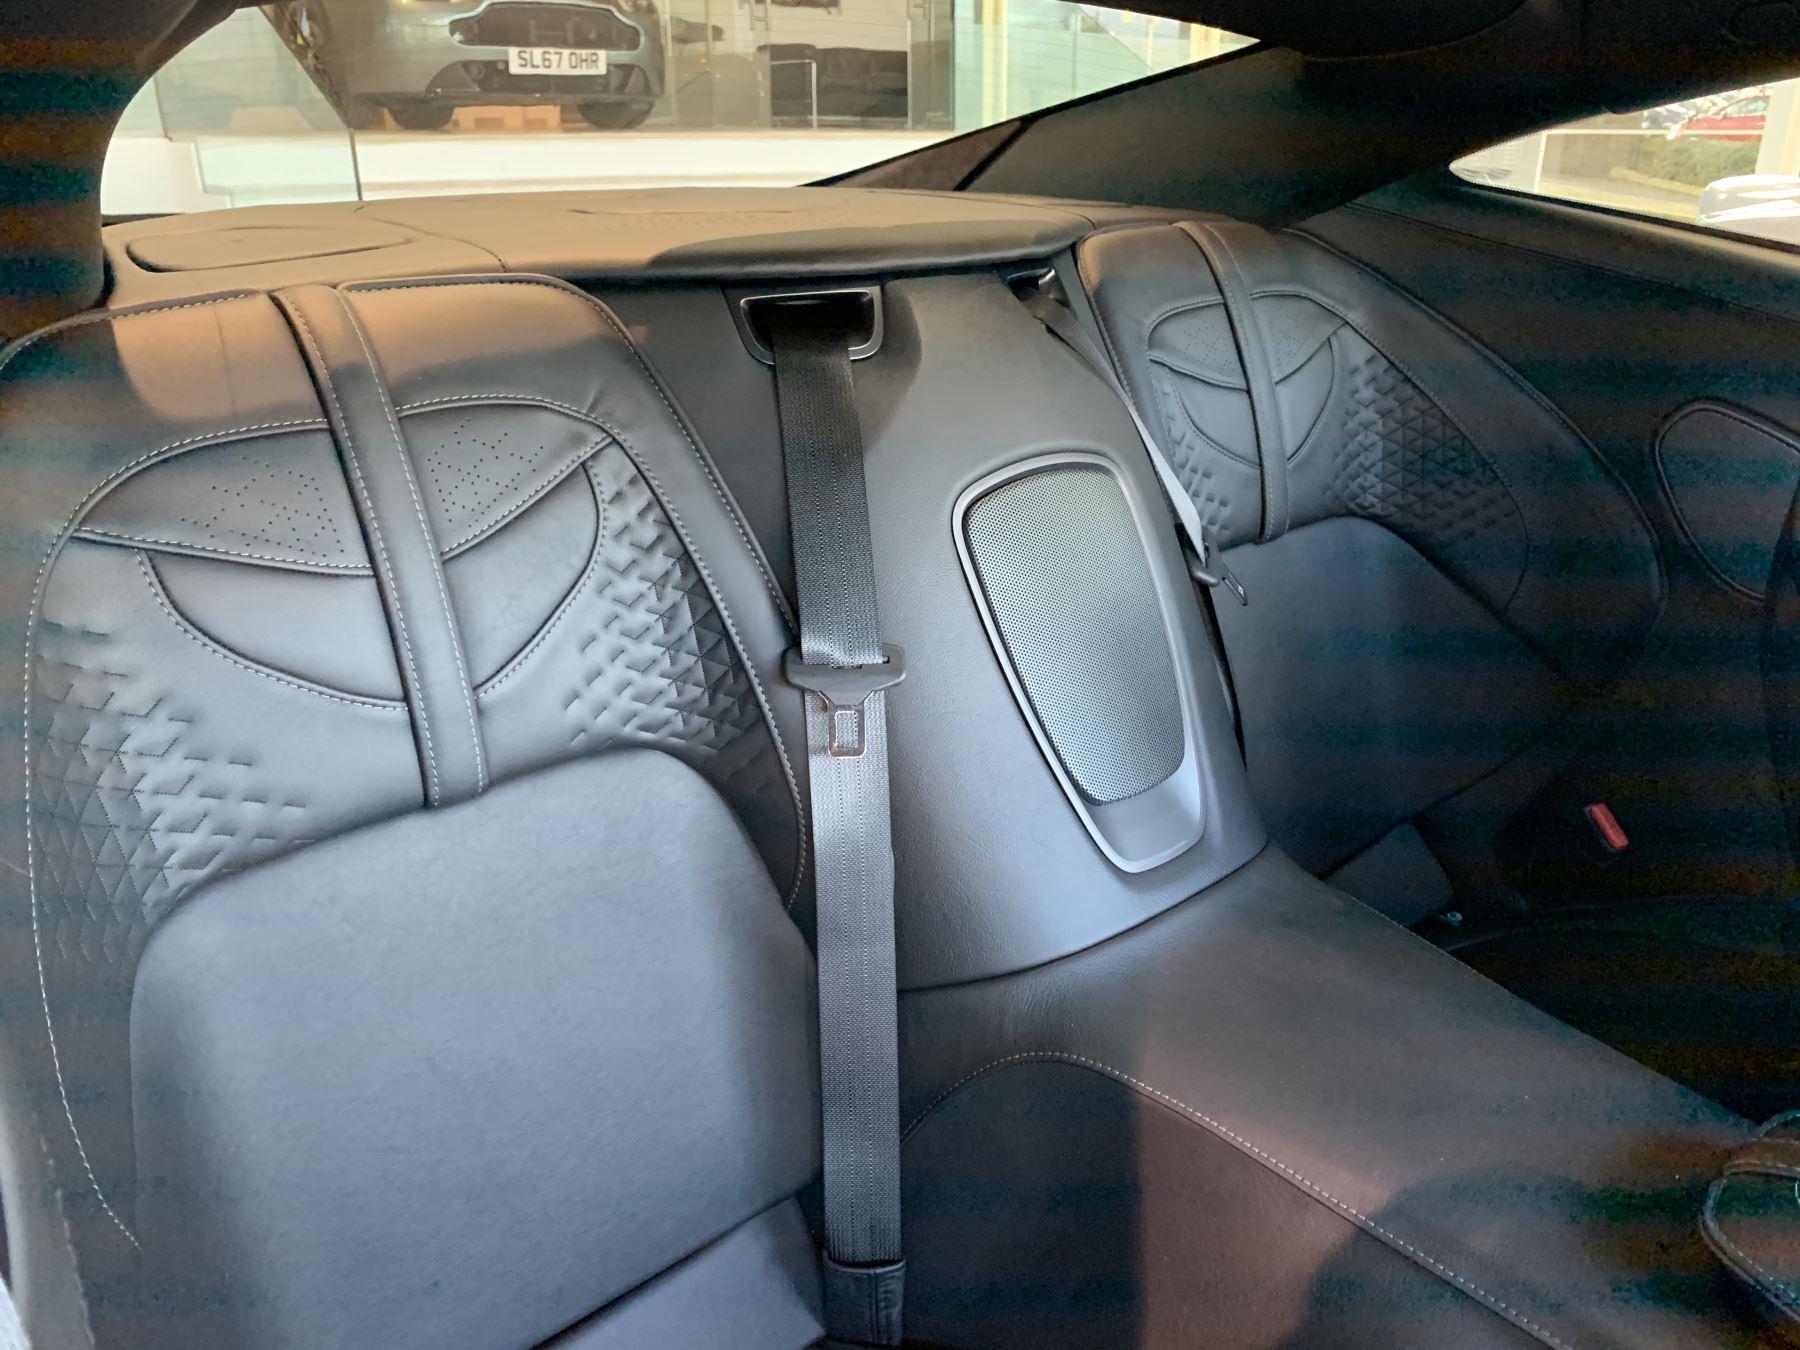 Aston Martin DBS Superleggera V12 Superleggera 2dr Touchtronic Auto image 19